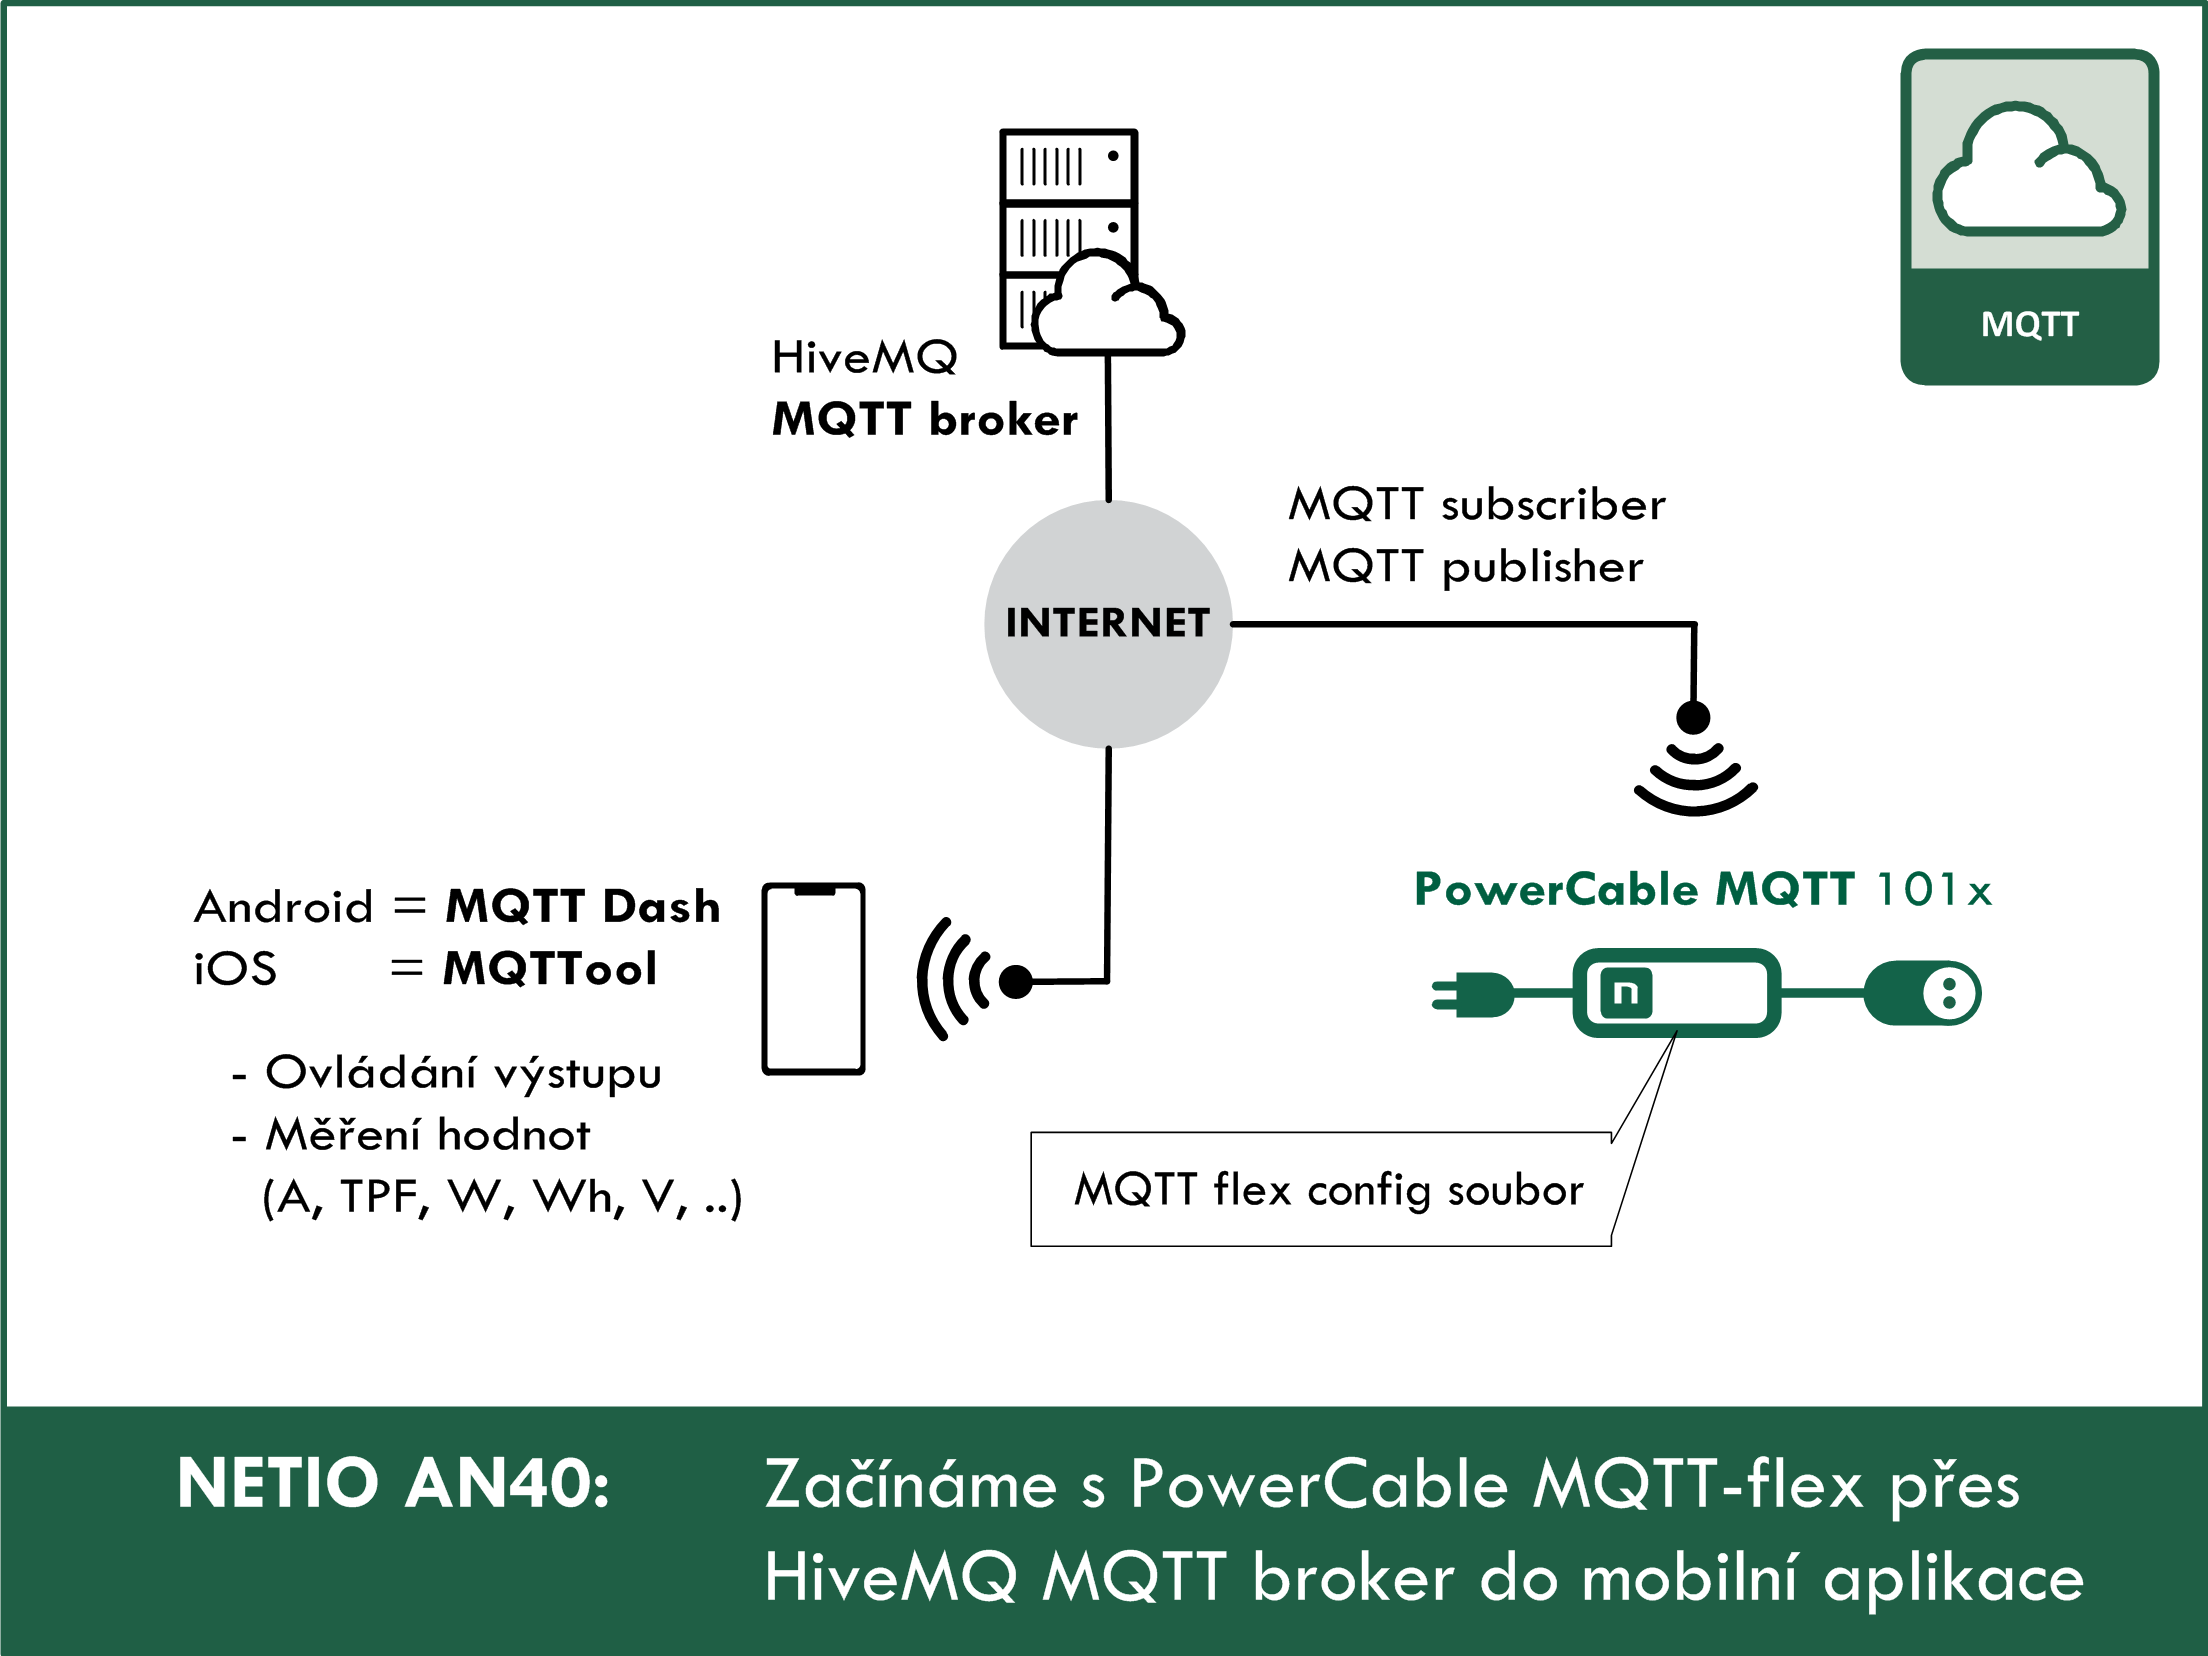 Zčínáme s PowerCable MQTT-flex přes HiveMQ broker